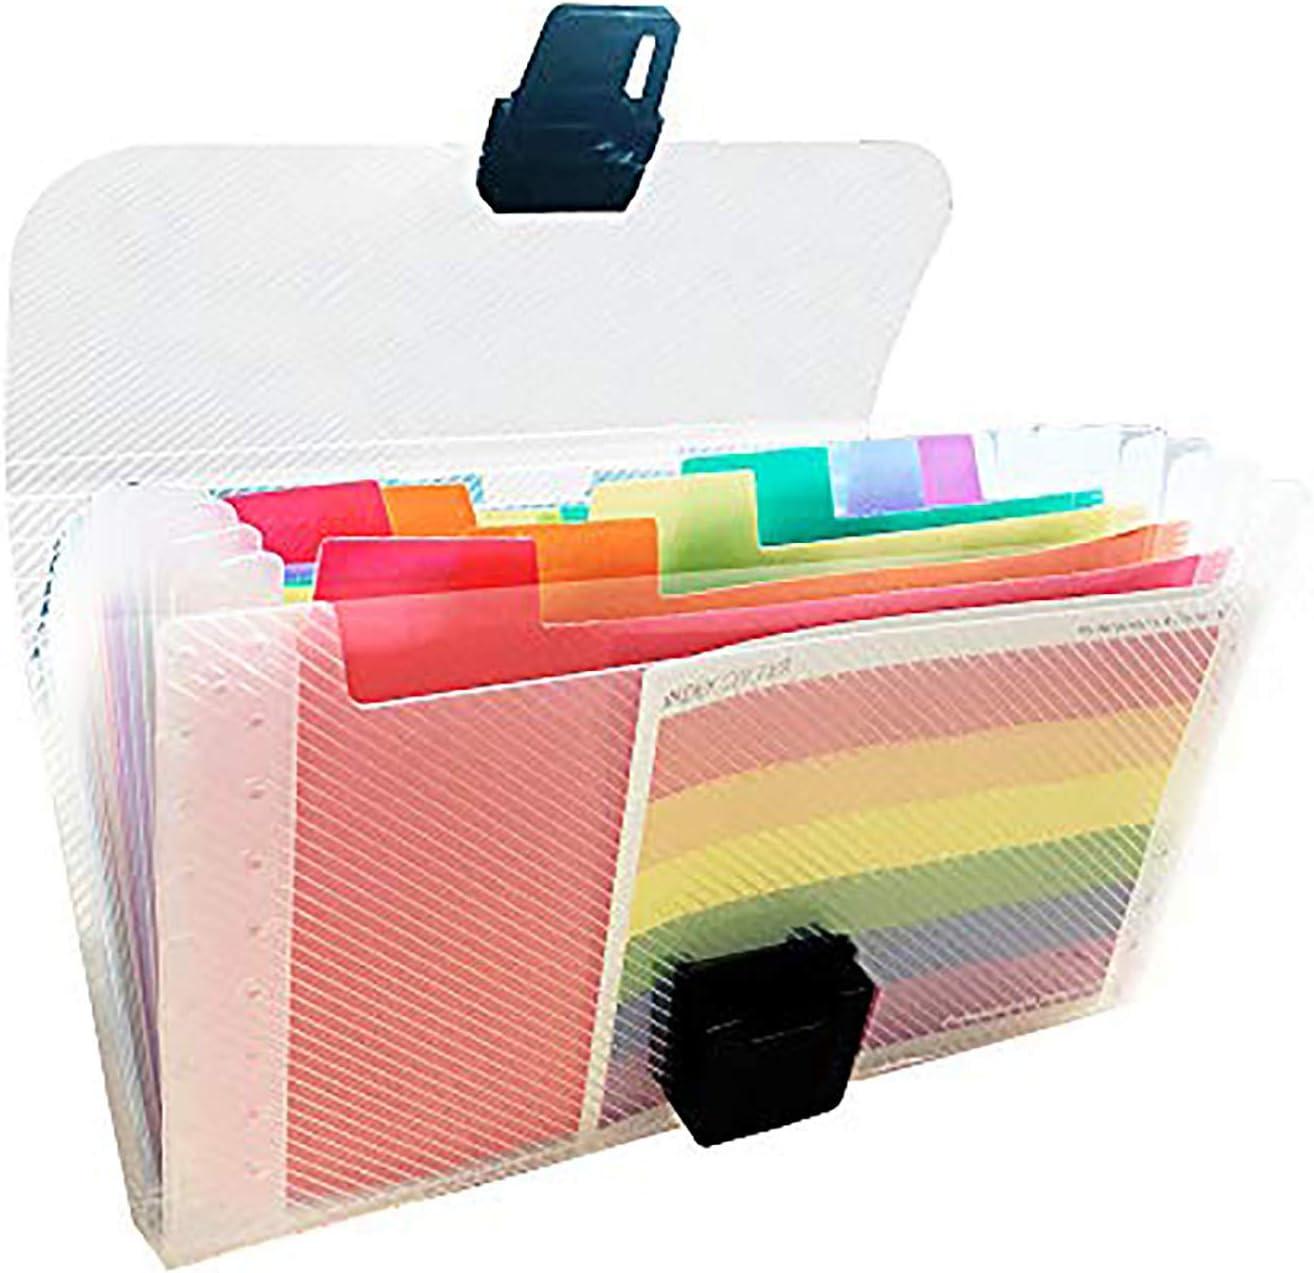 13 poches Classeur extensible portable accord/éon extensible A5 format A4 A4